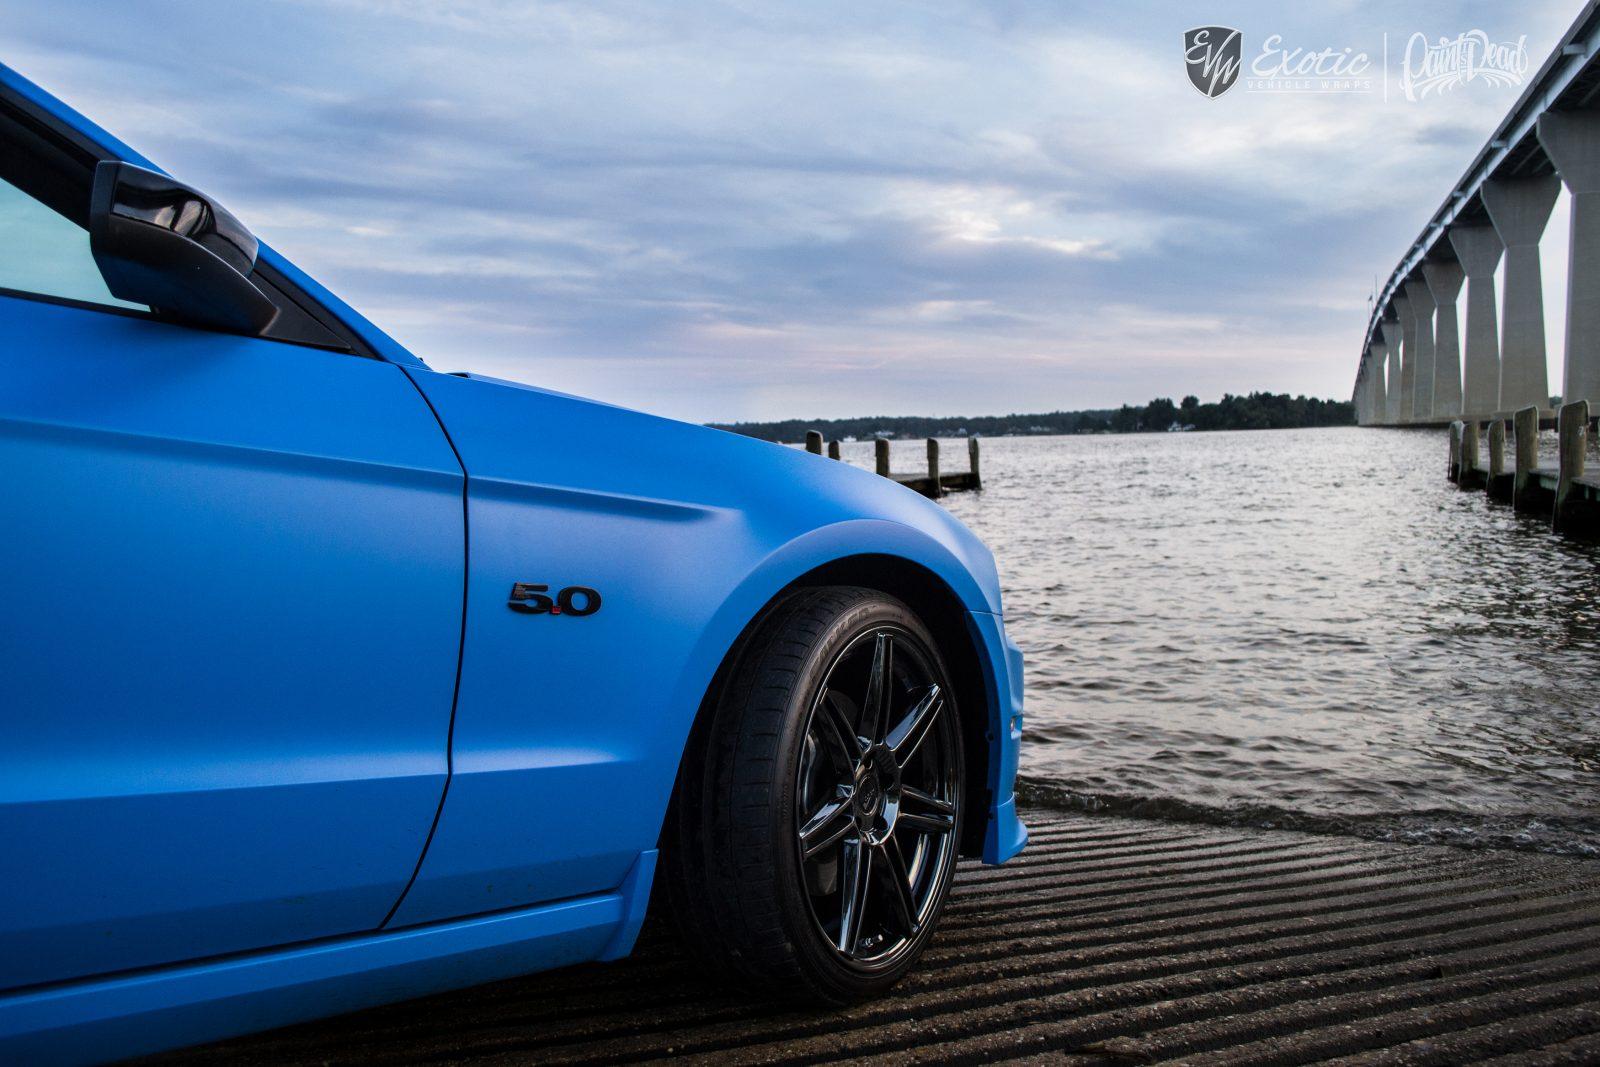 Satin Intense Blue Avery Mustang Solomons Rearside Wm Resize